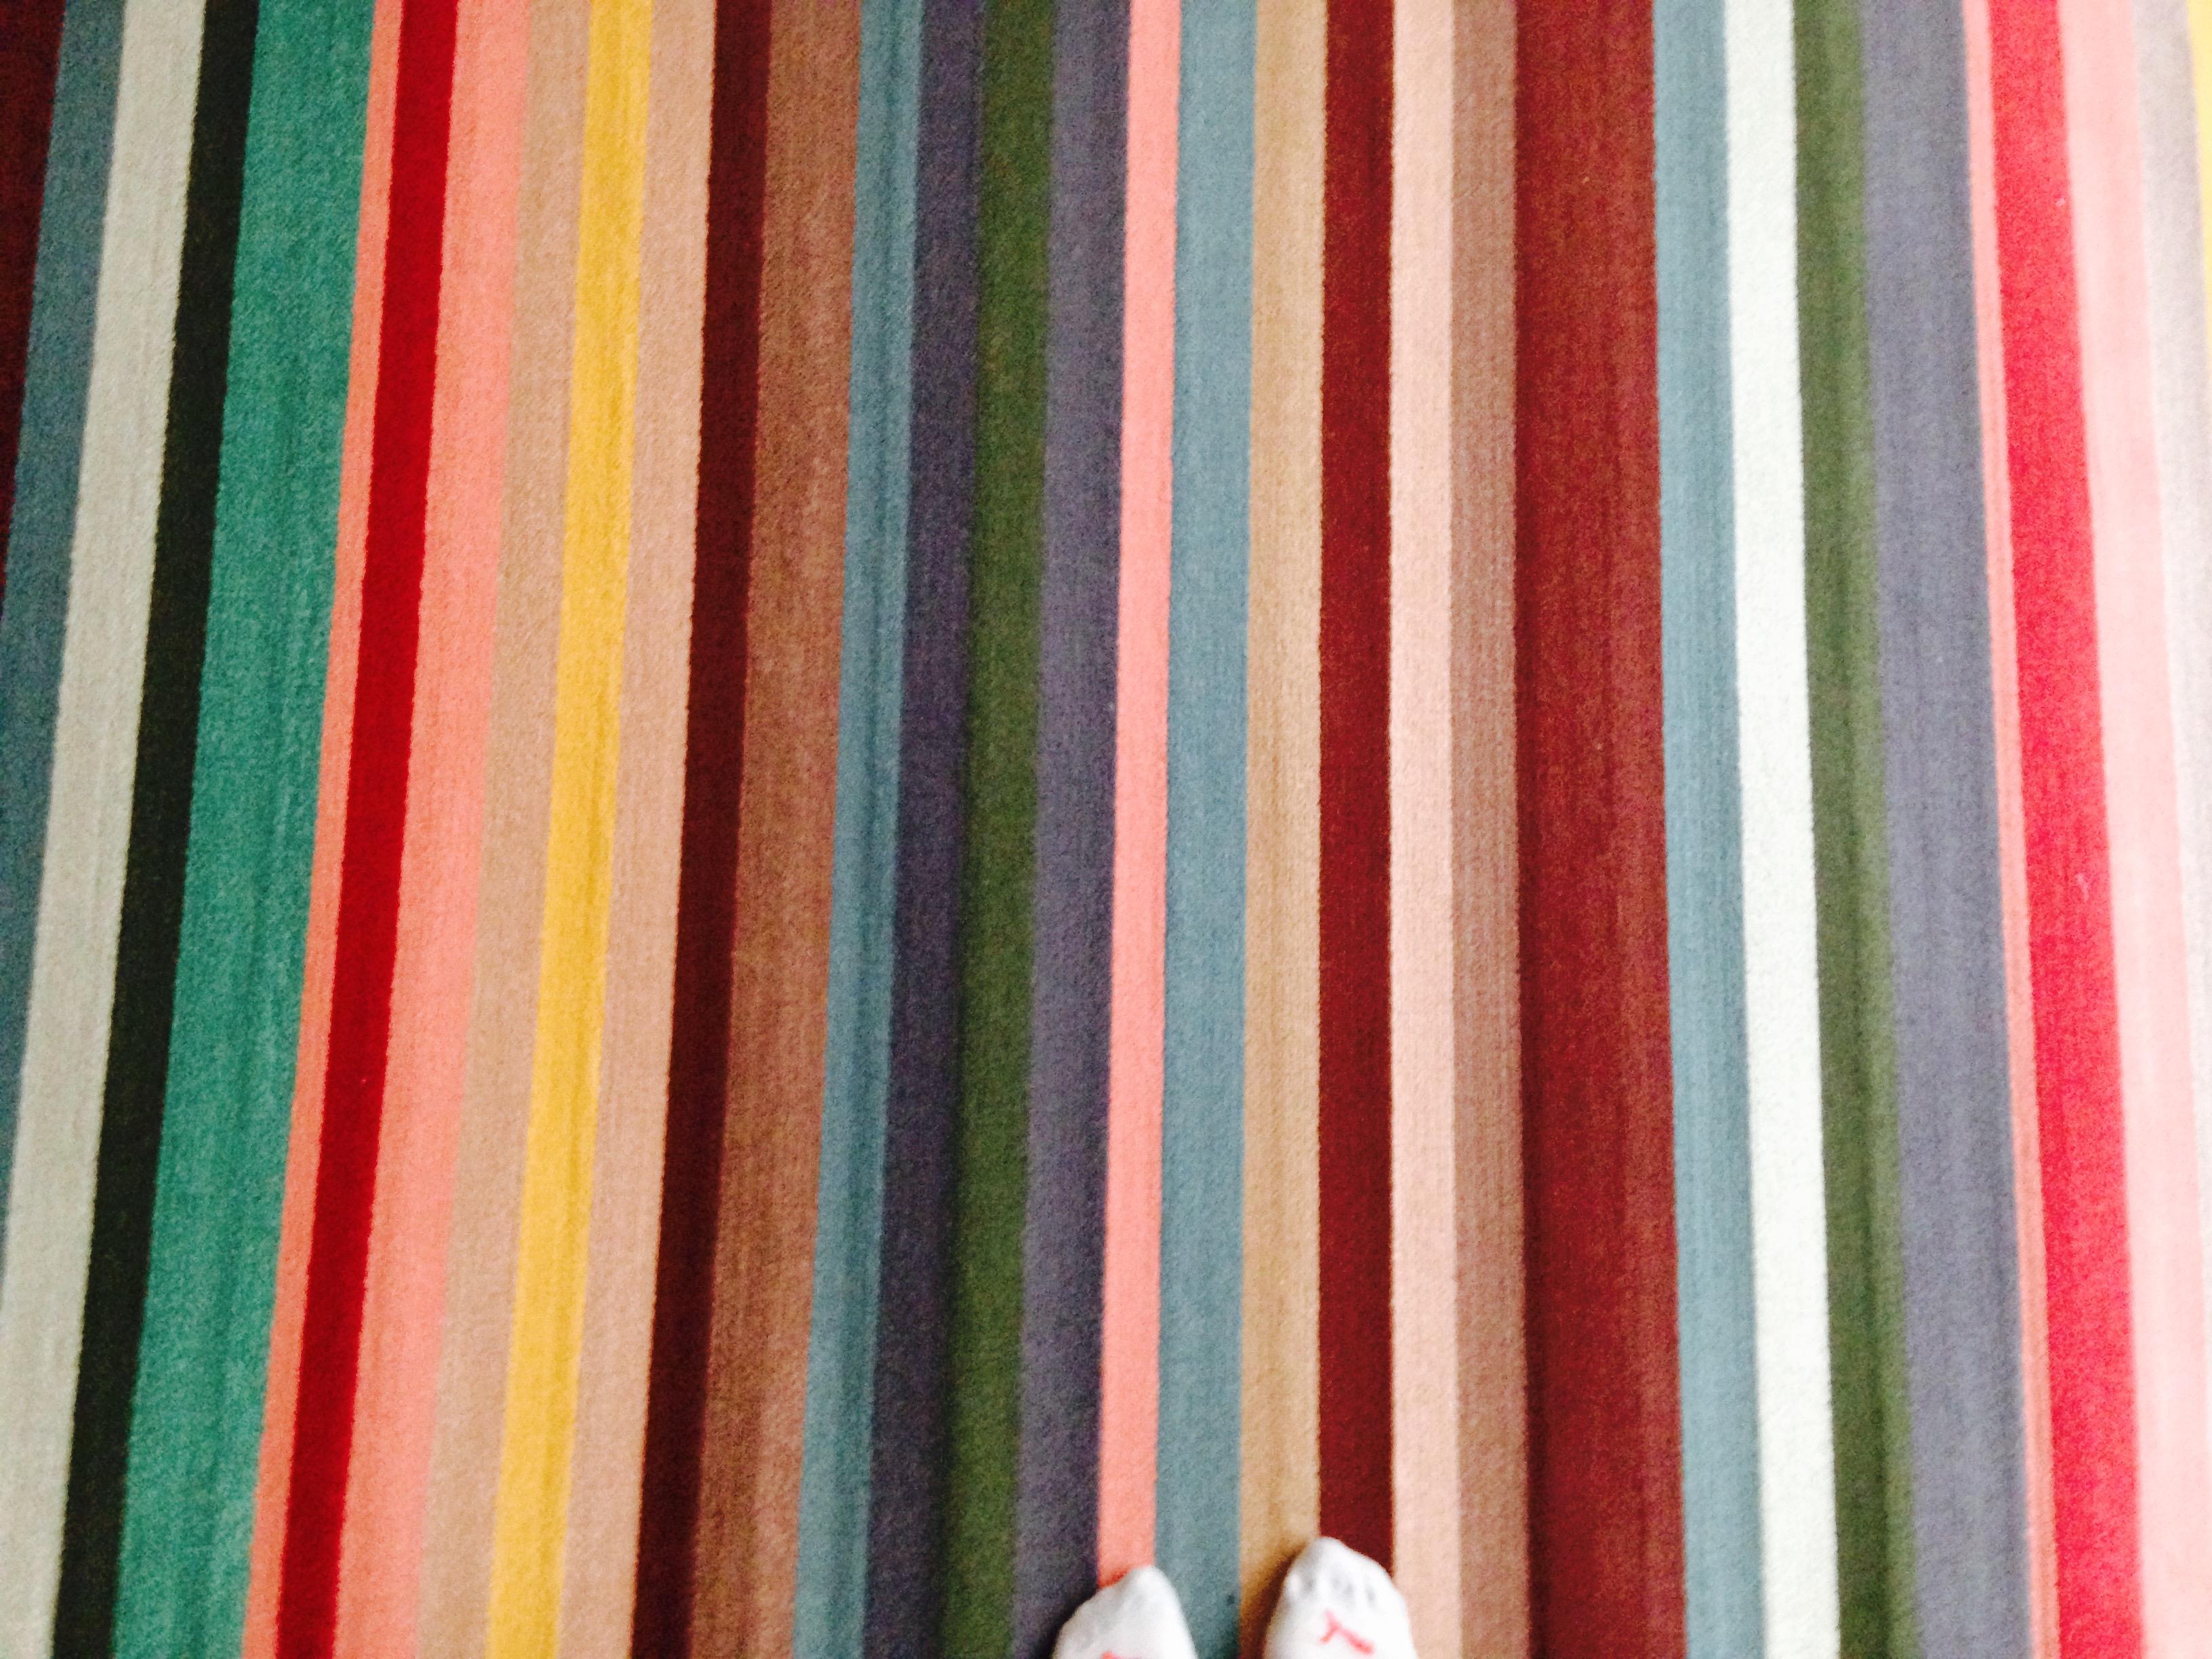 Sarah Welstead StayAwake rug